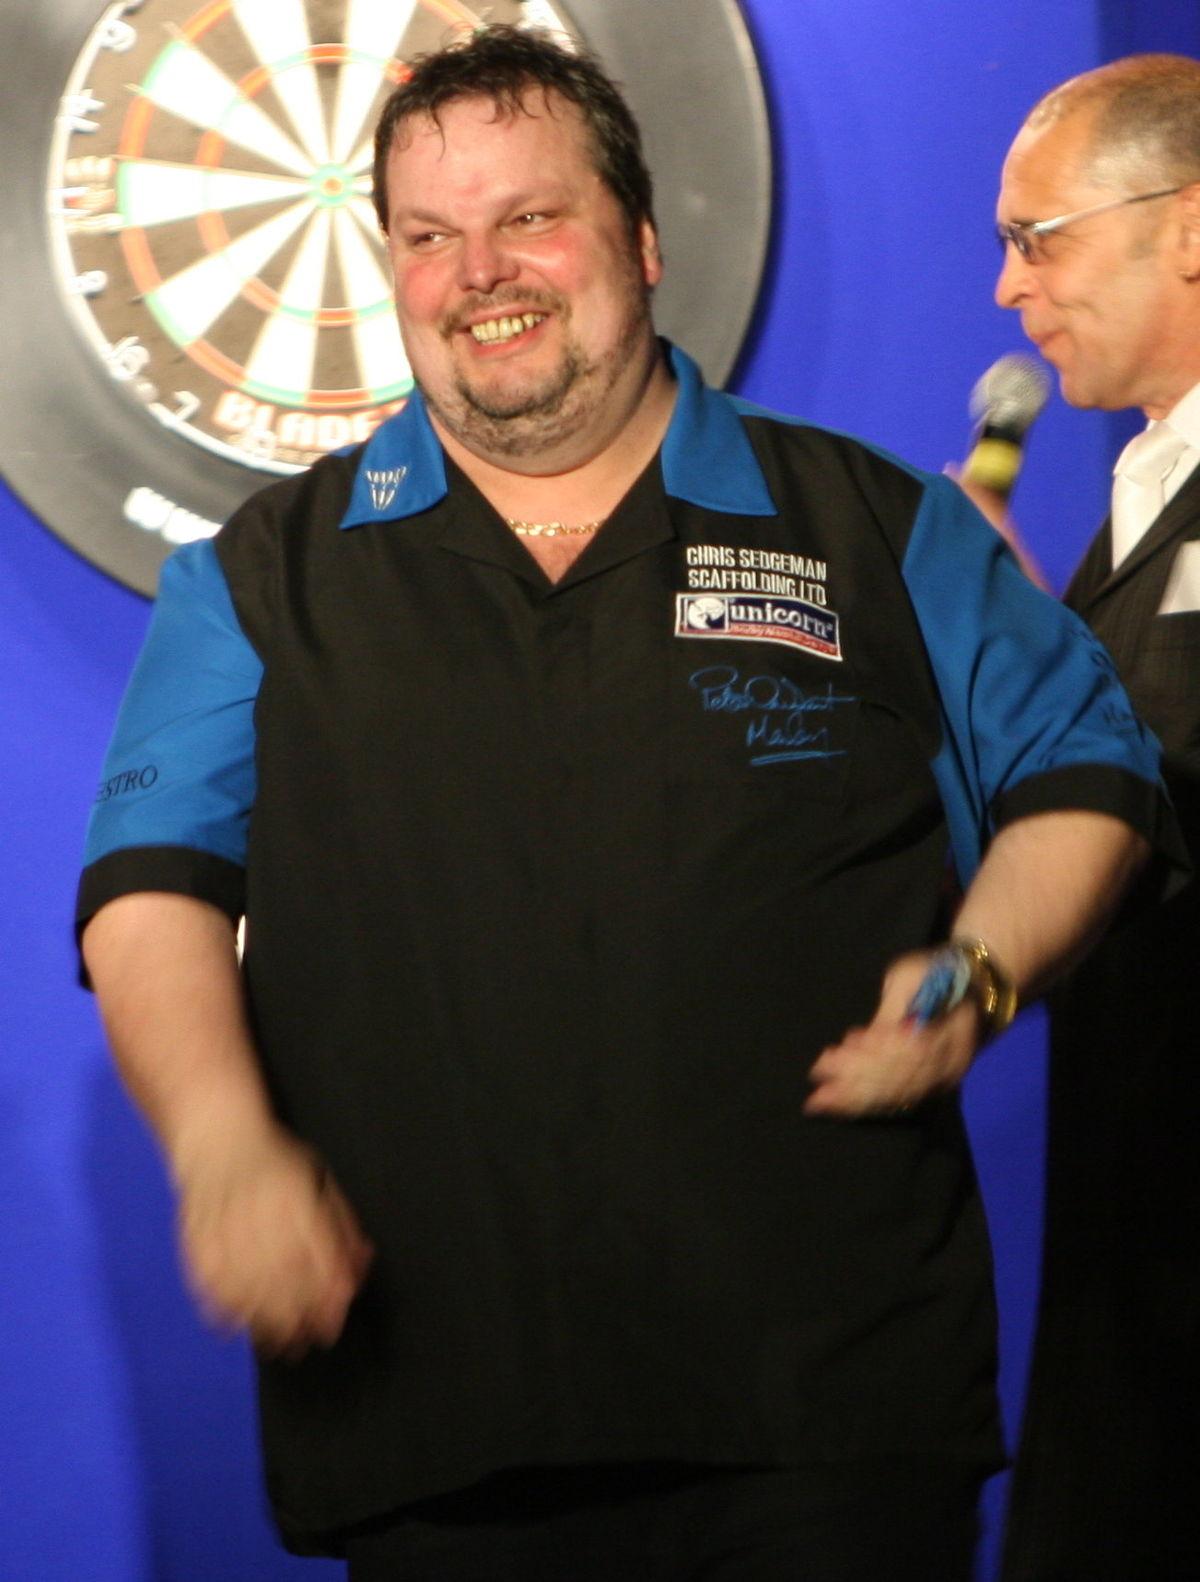 peter manley darts